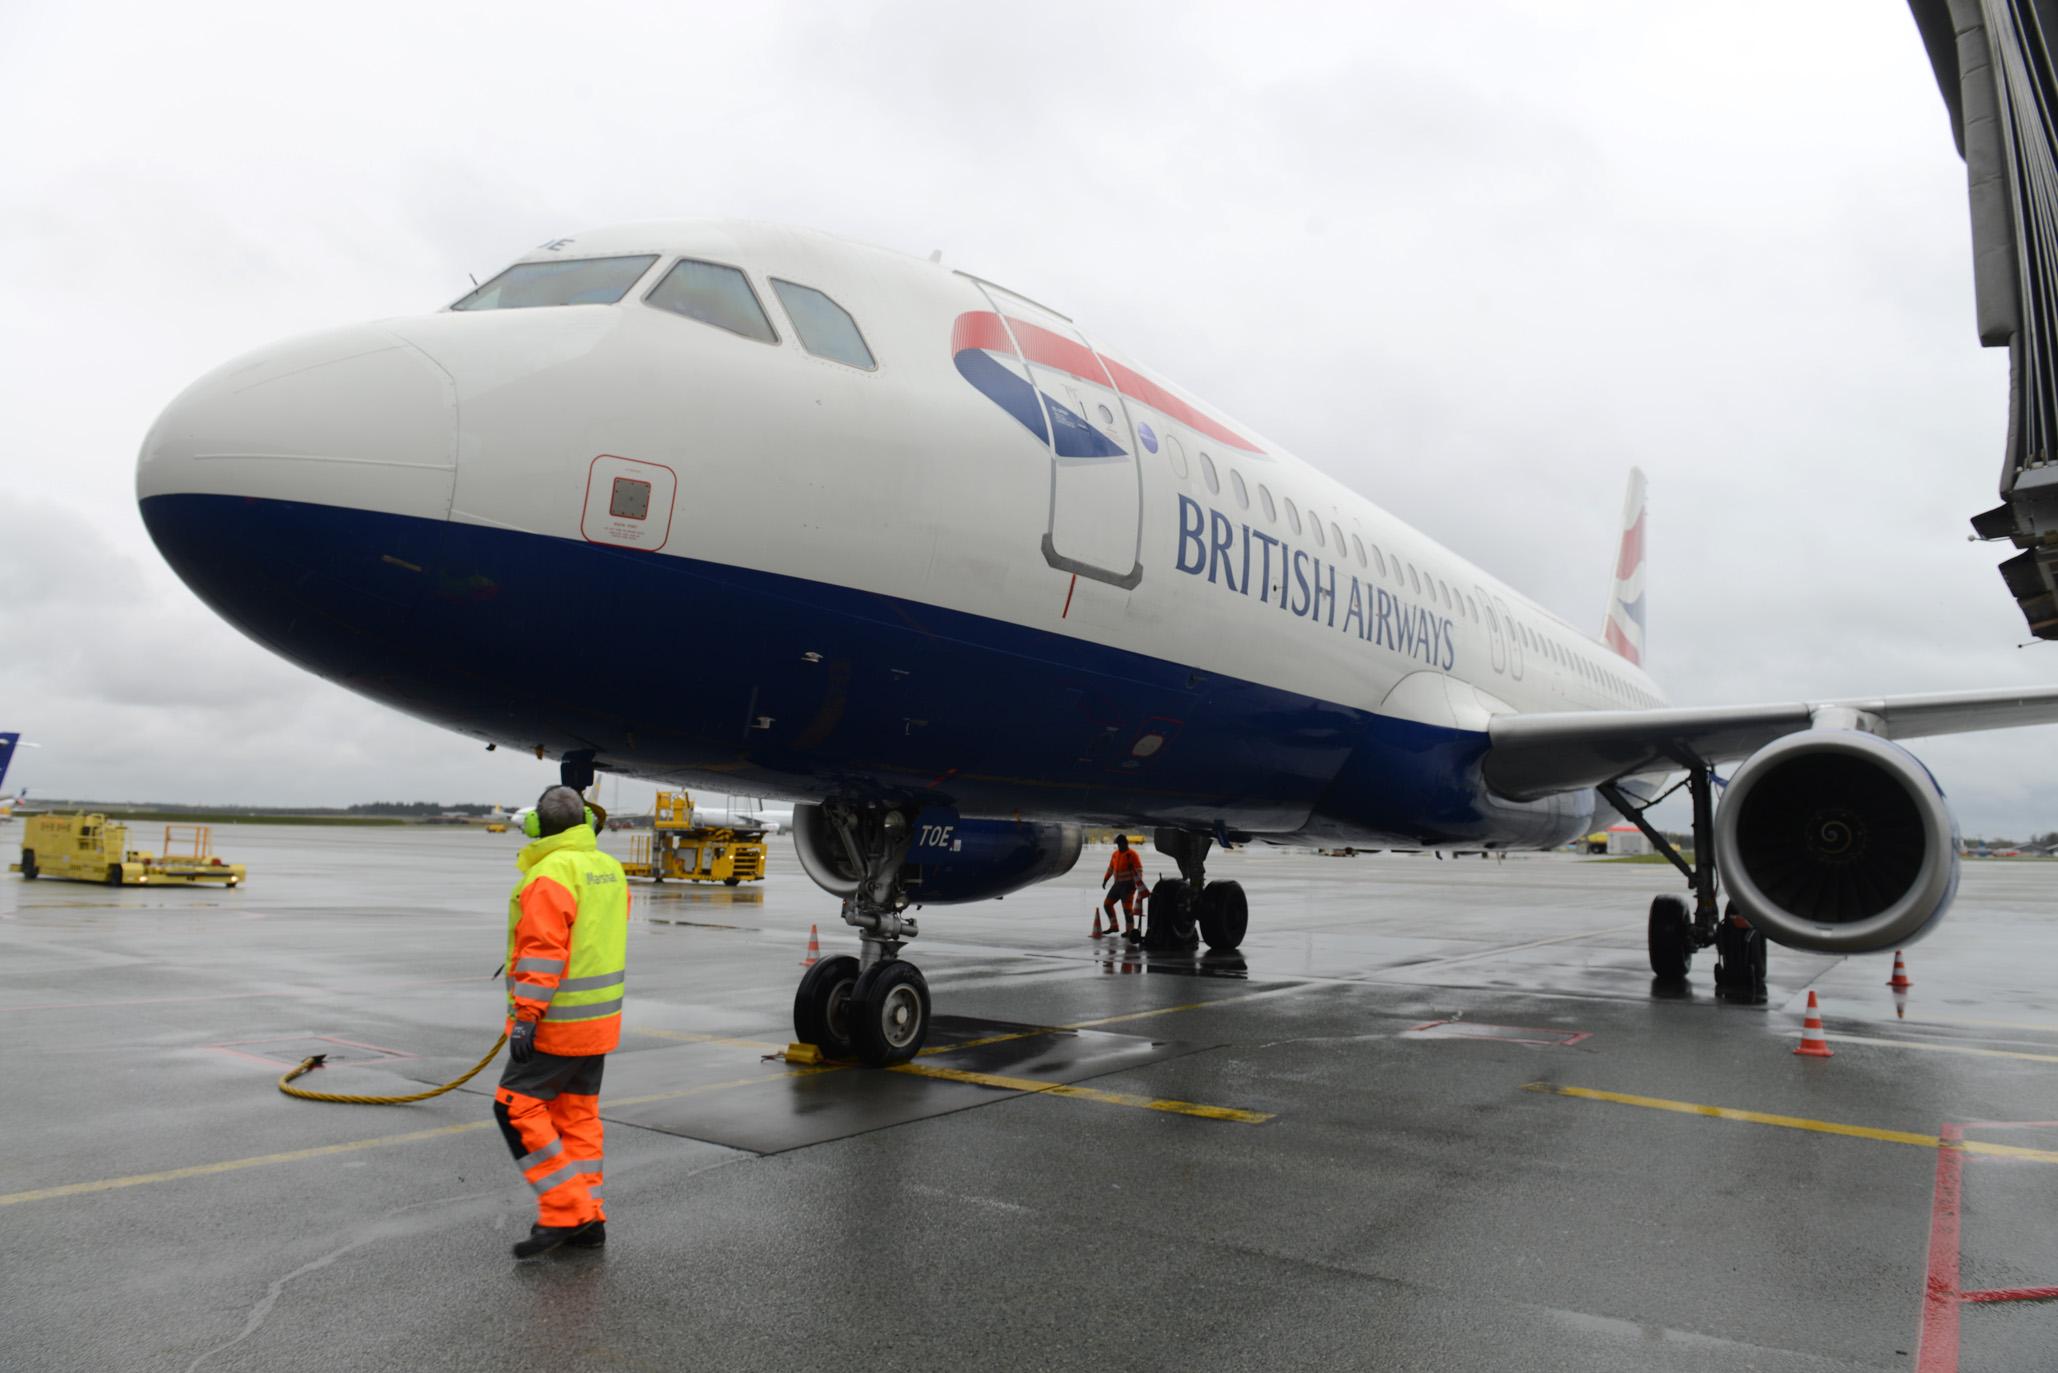 British Airways-fly i Billund Lufthavn (Foto: Joakim J. Hvistendahl)